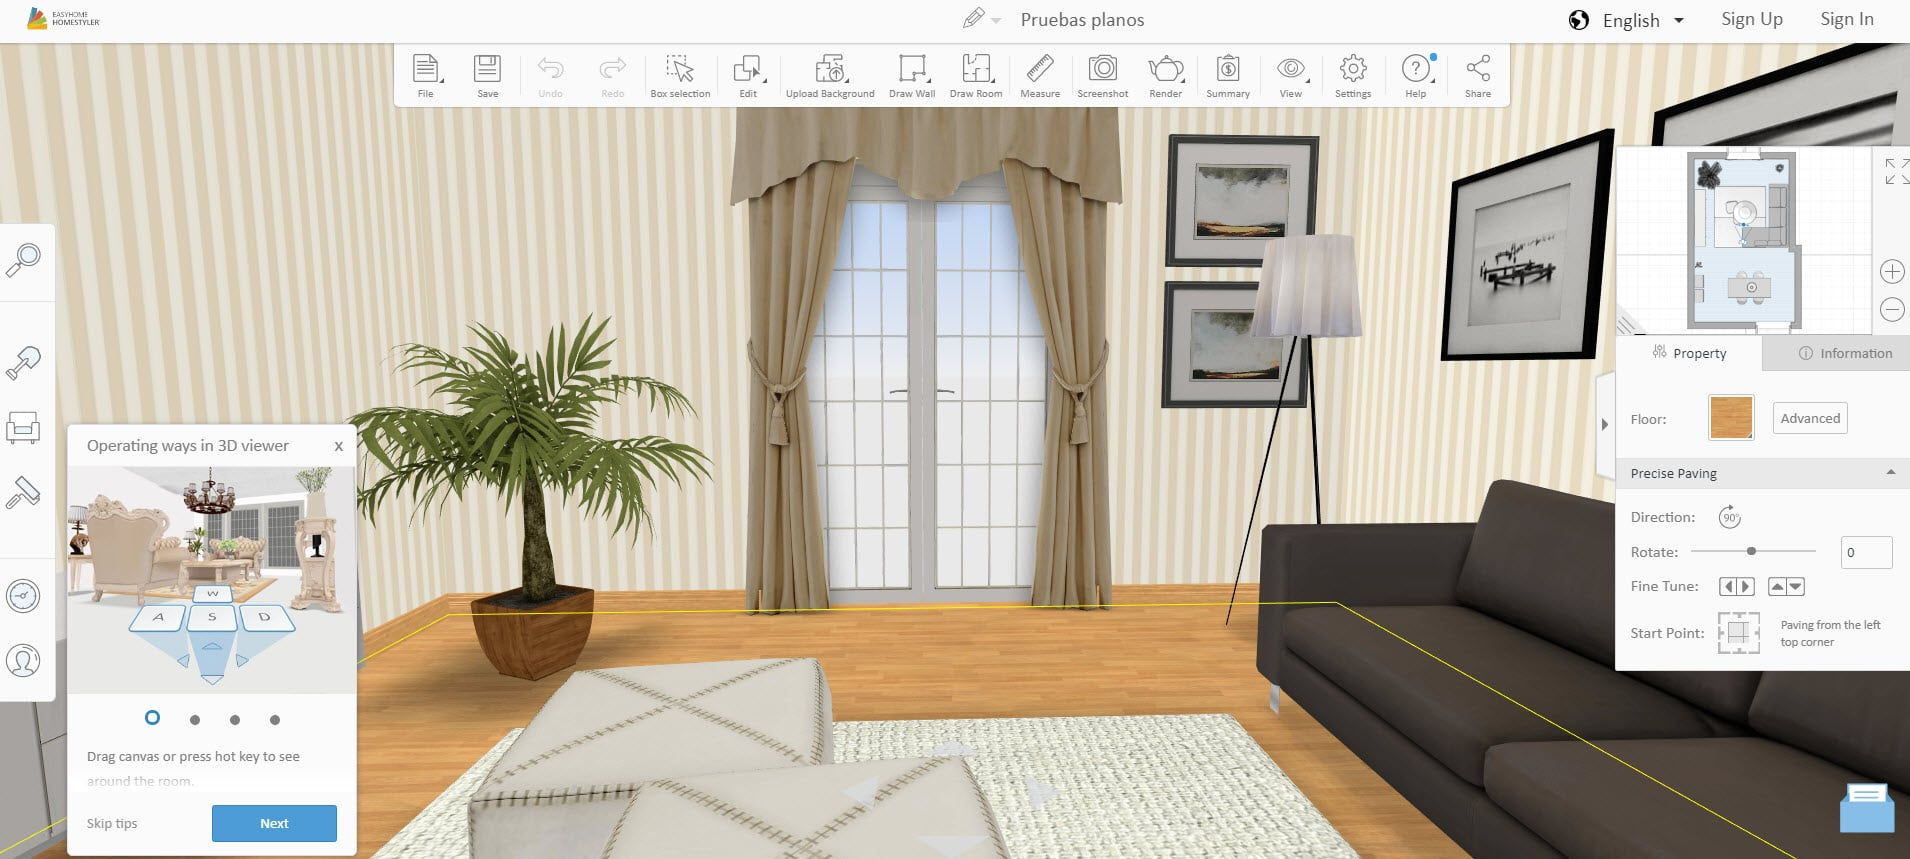 10 aplicaciones dise o de planos e interiores construye